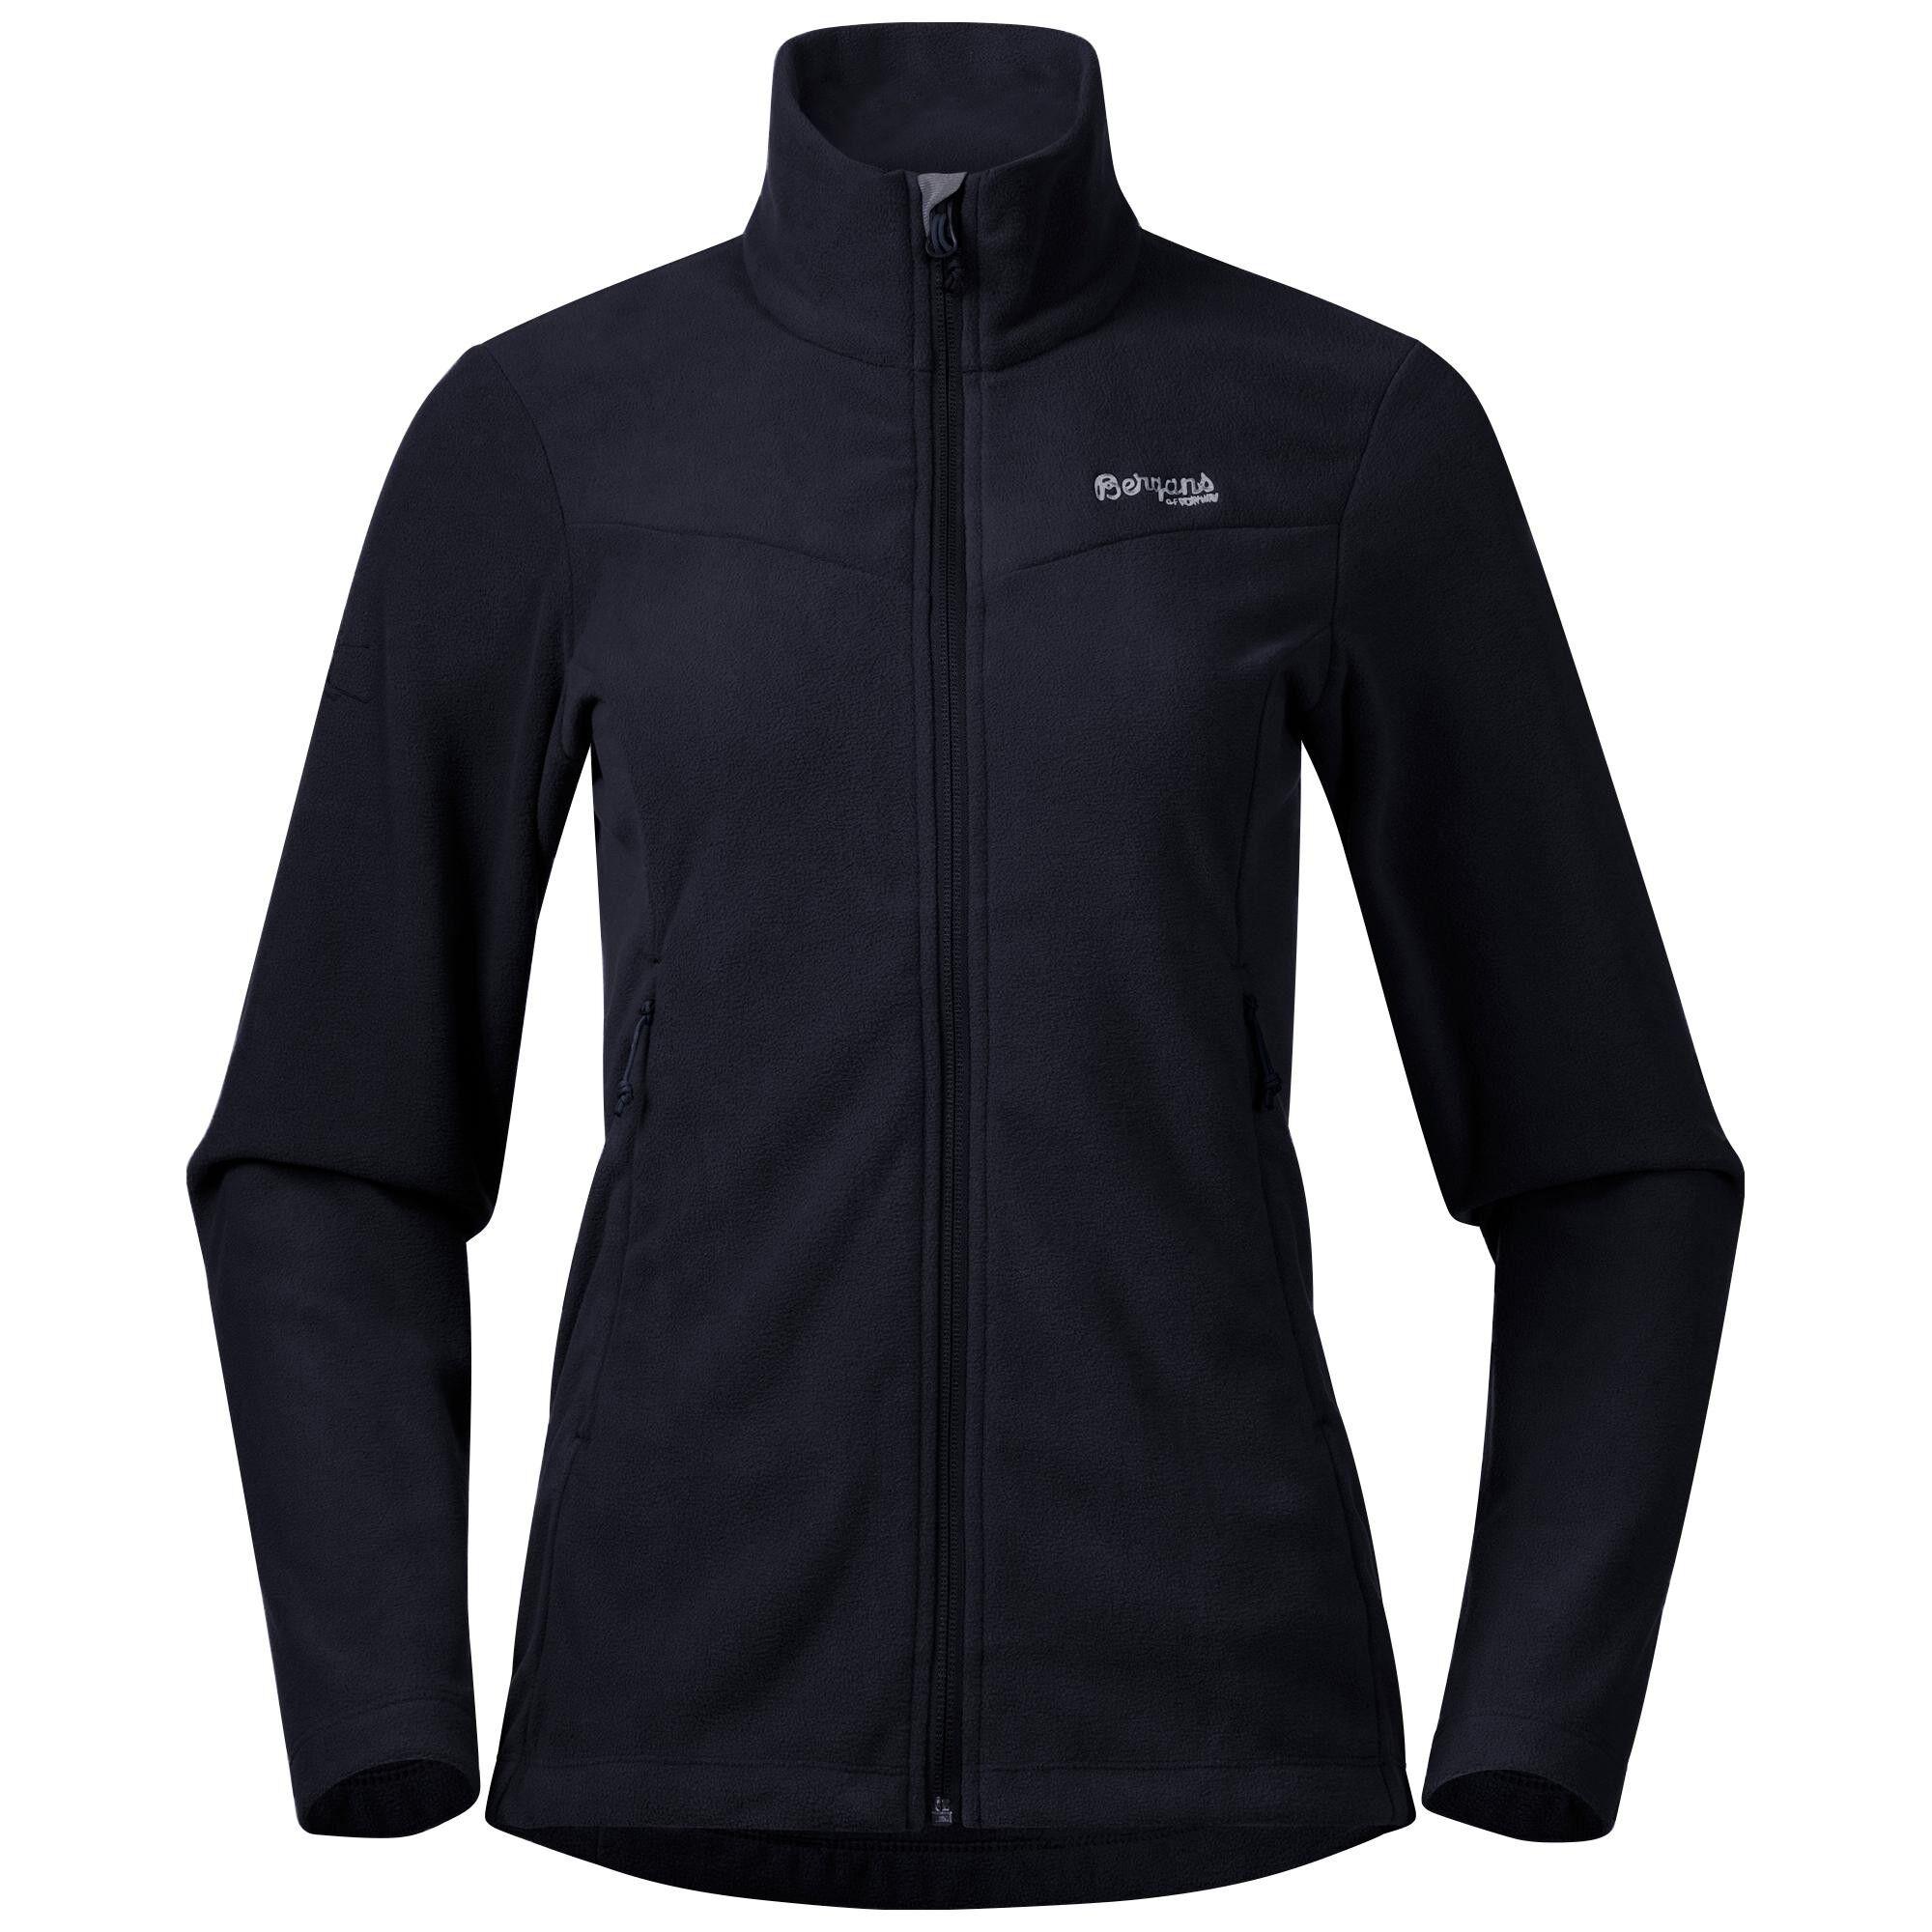 Bergans Finnsnes Jacket, fleecejakke dame